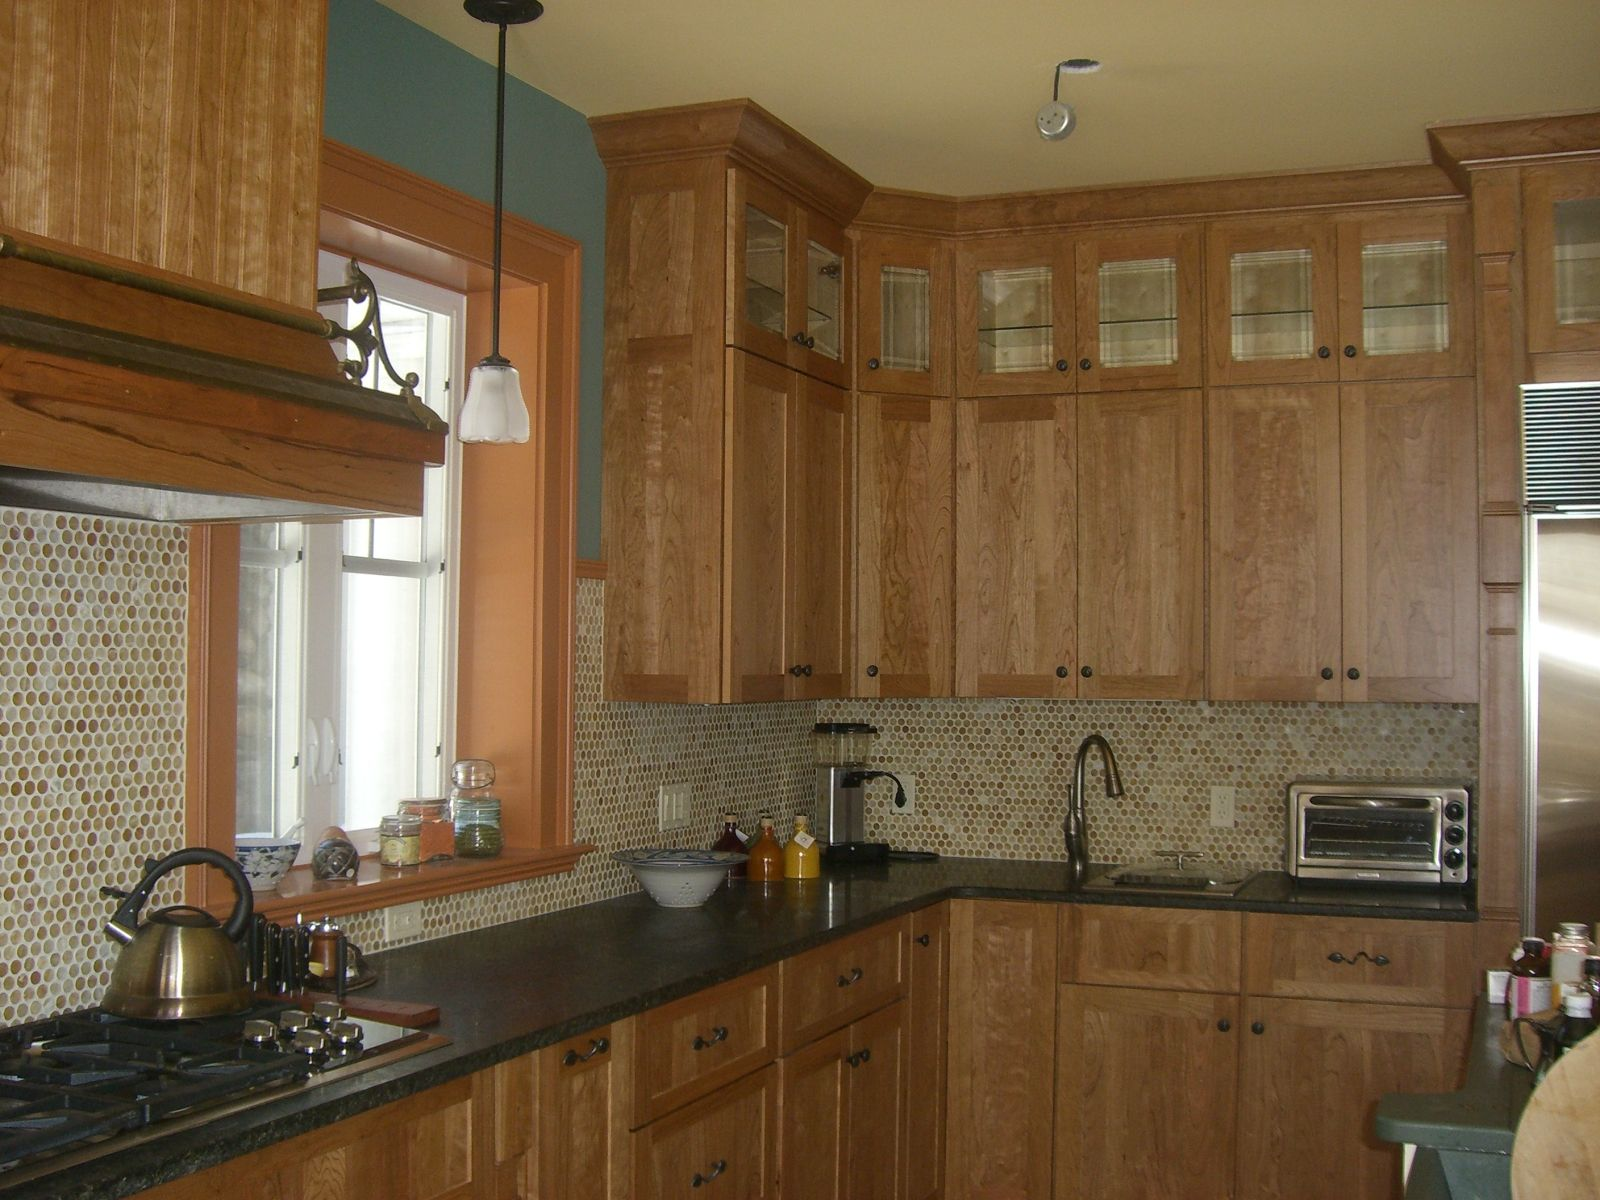 dark counter light backsplash condo kitchen kitchen remodel upper cabinets on kitchen cabinets upper id=86300